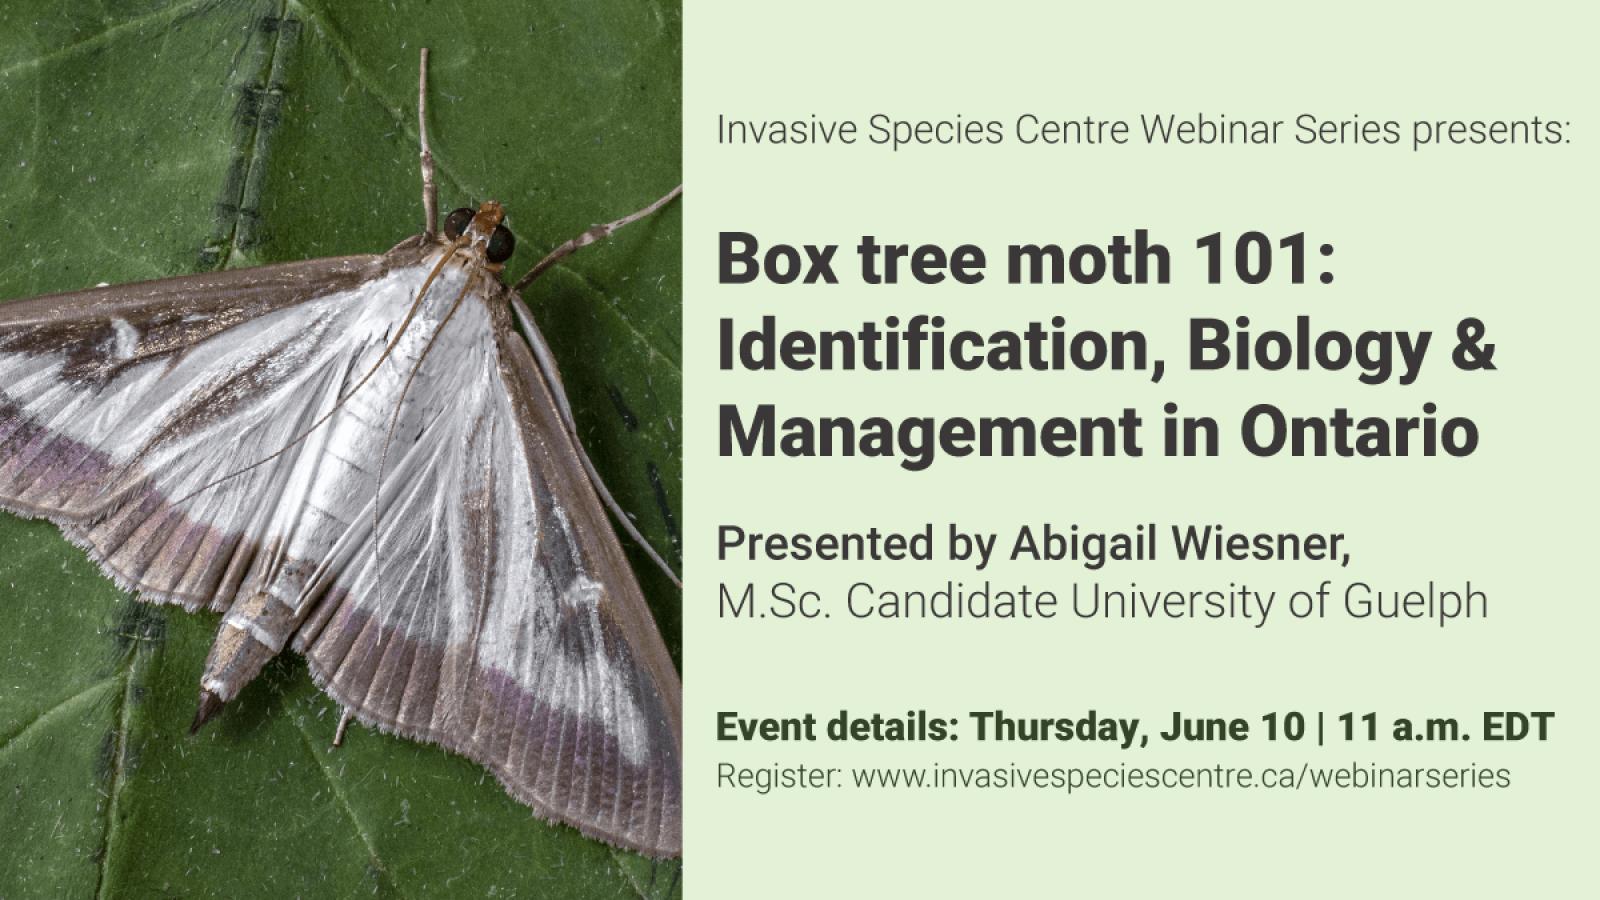 Box tree moth 101 webinar